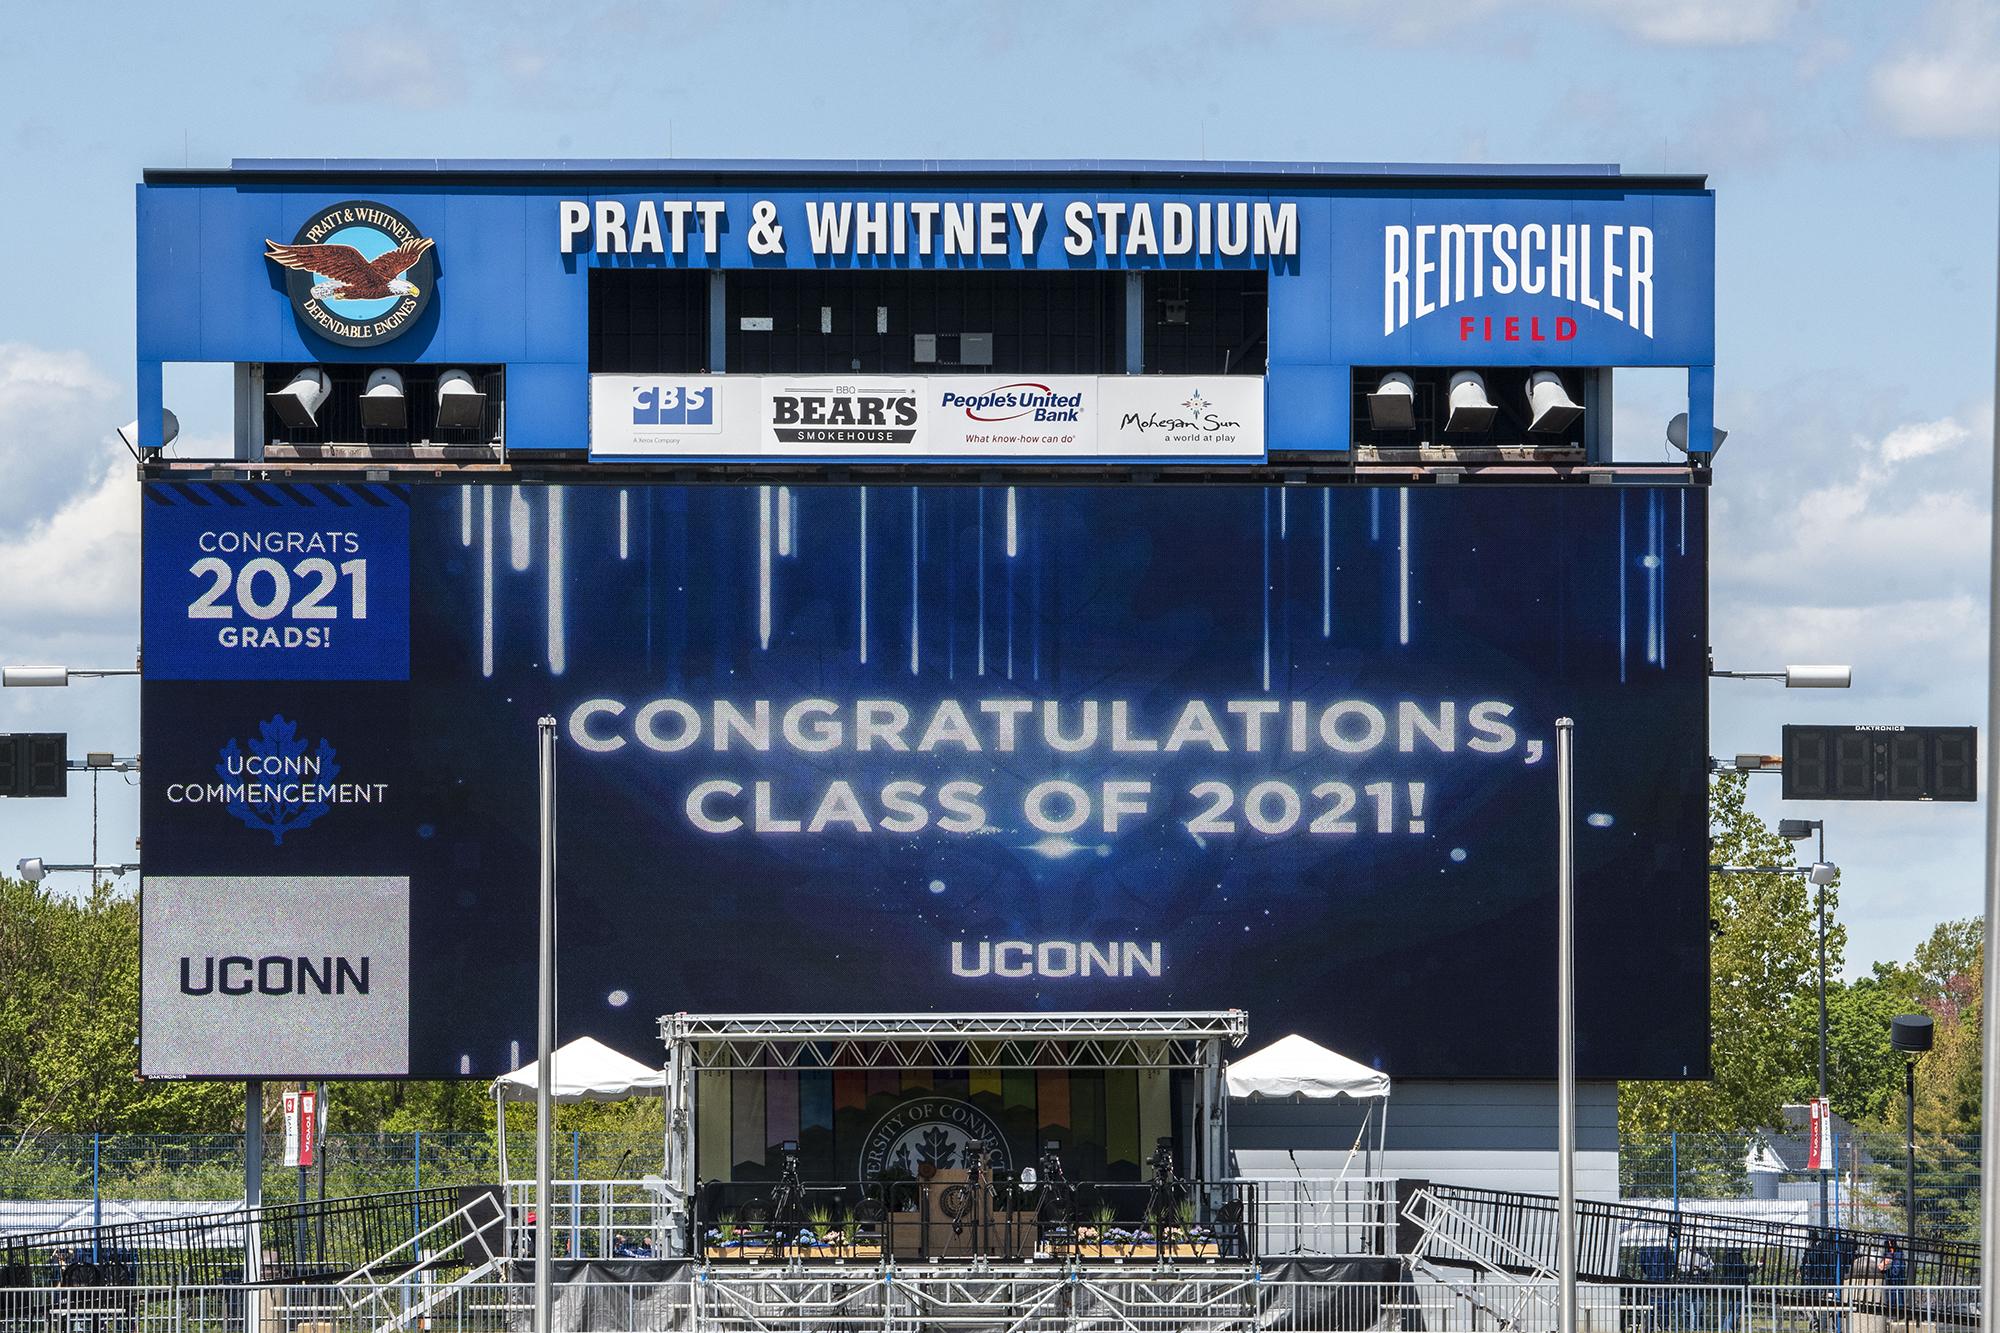 Congratulations, class of 2021